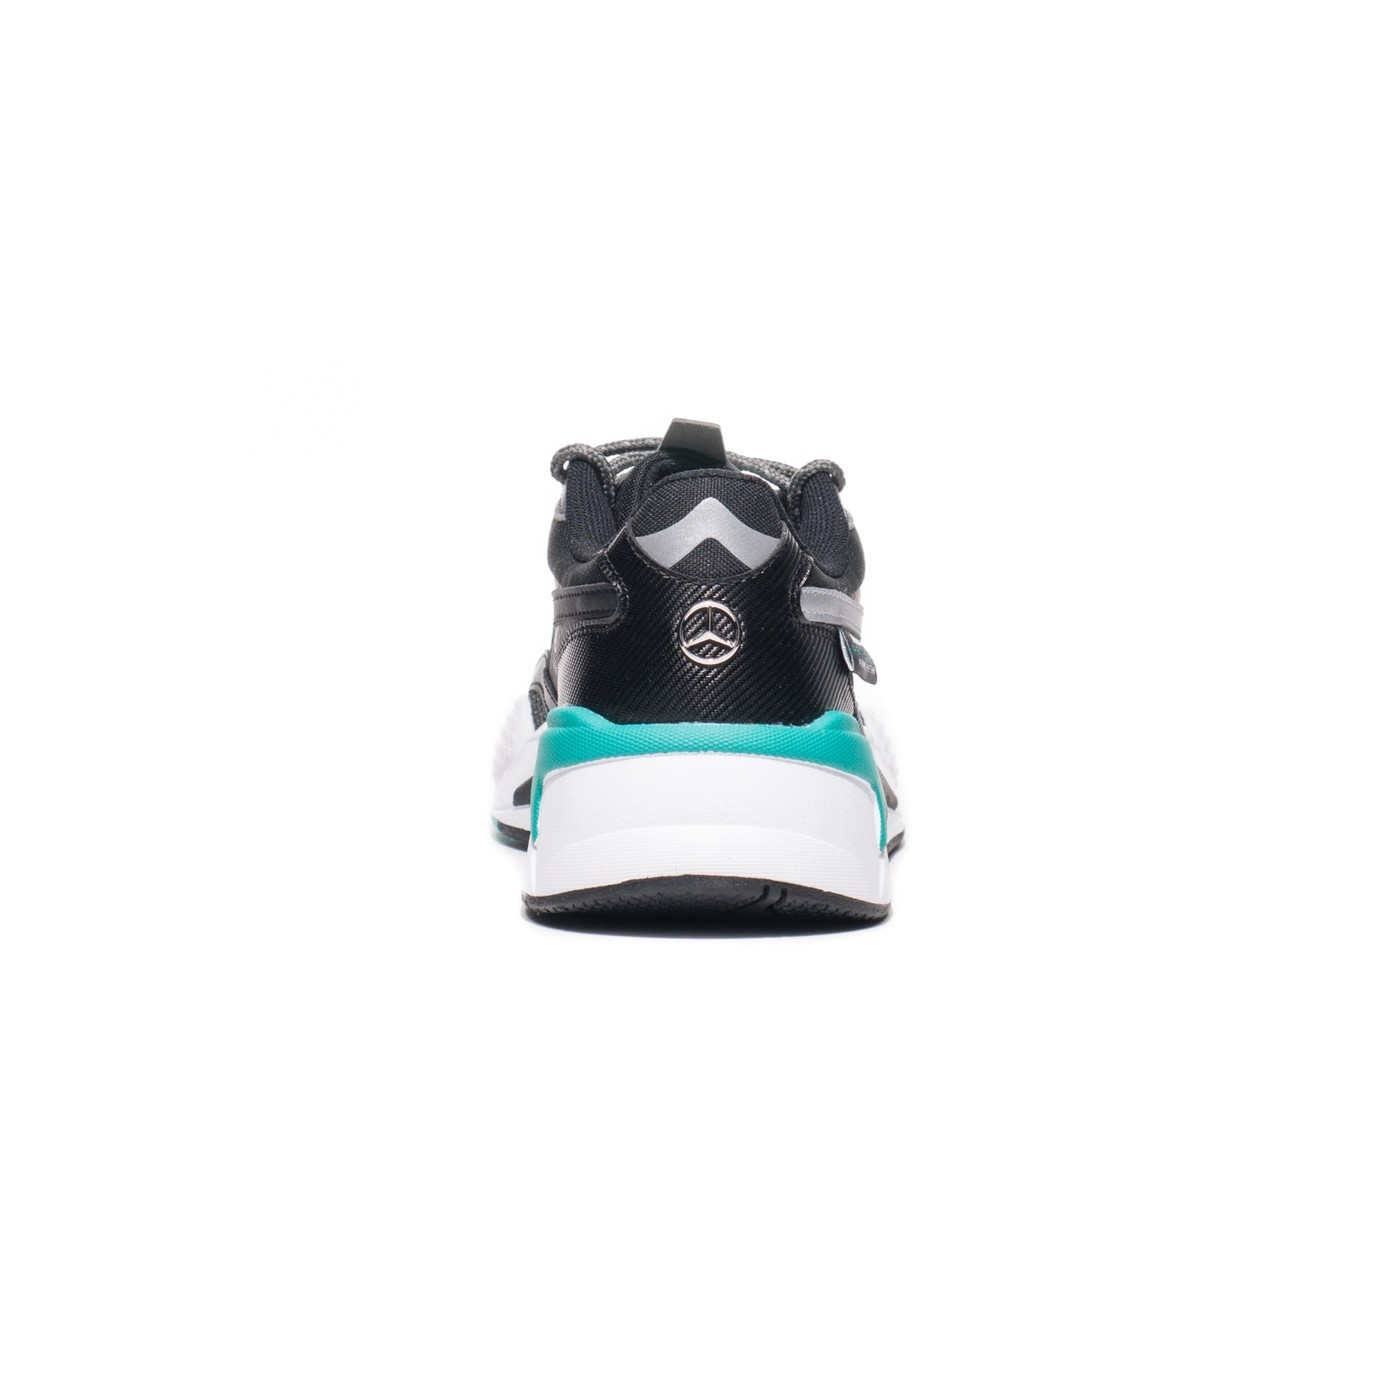 Кросівки чоловічі Puma MERCEDES F1 RS-X³ MOTORSPORT